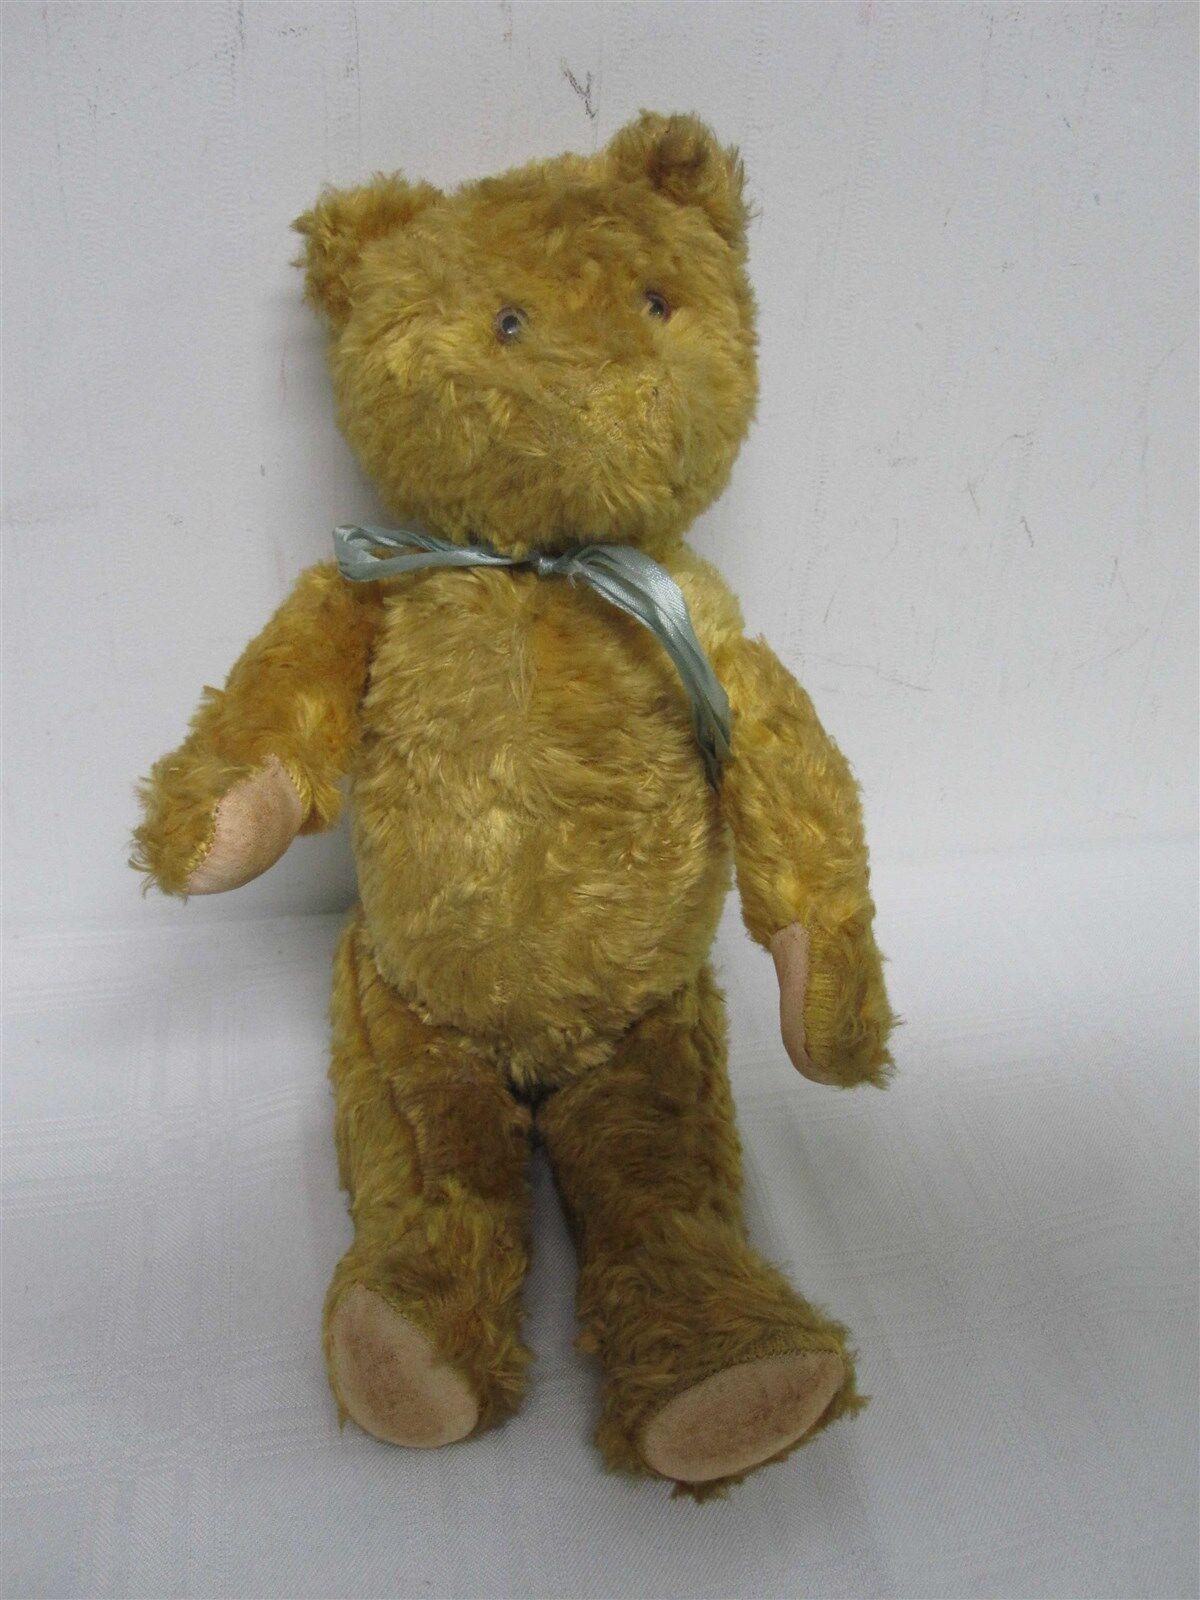 TIDIGARE ANTIQUE STEIFF guldEN JONTERAD TEDDY BEAR